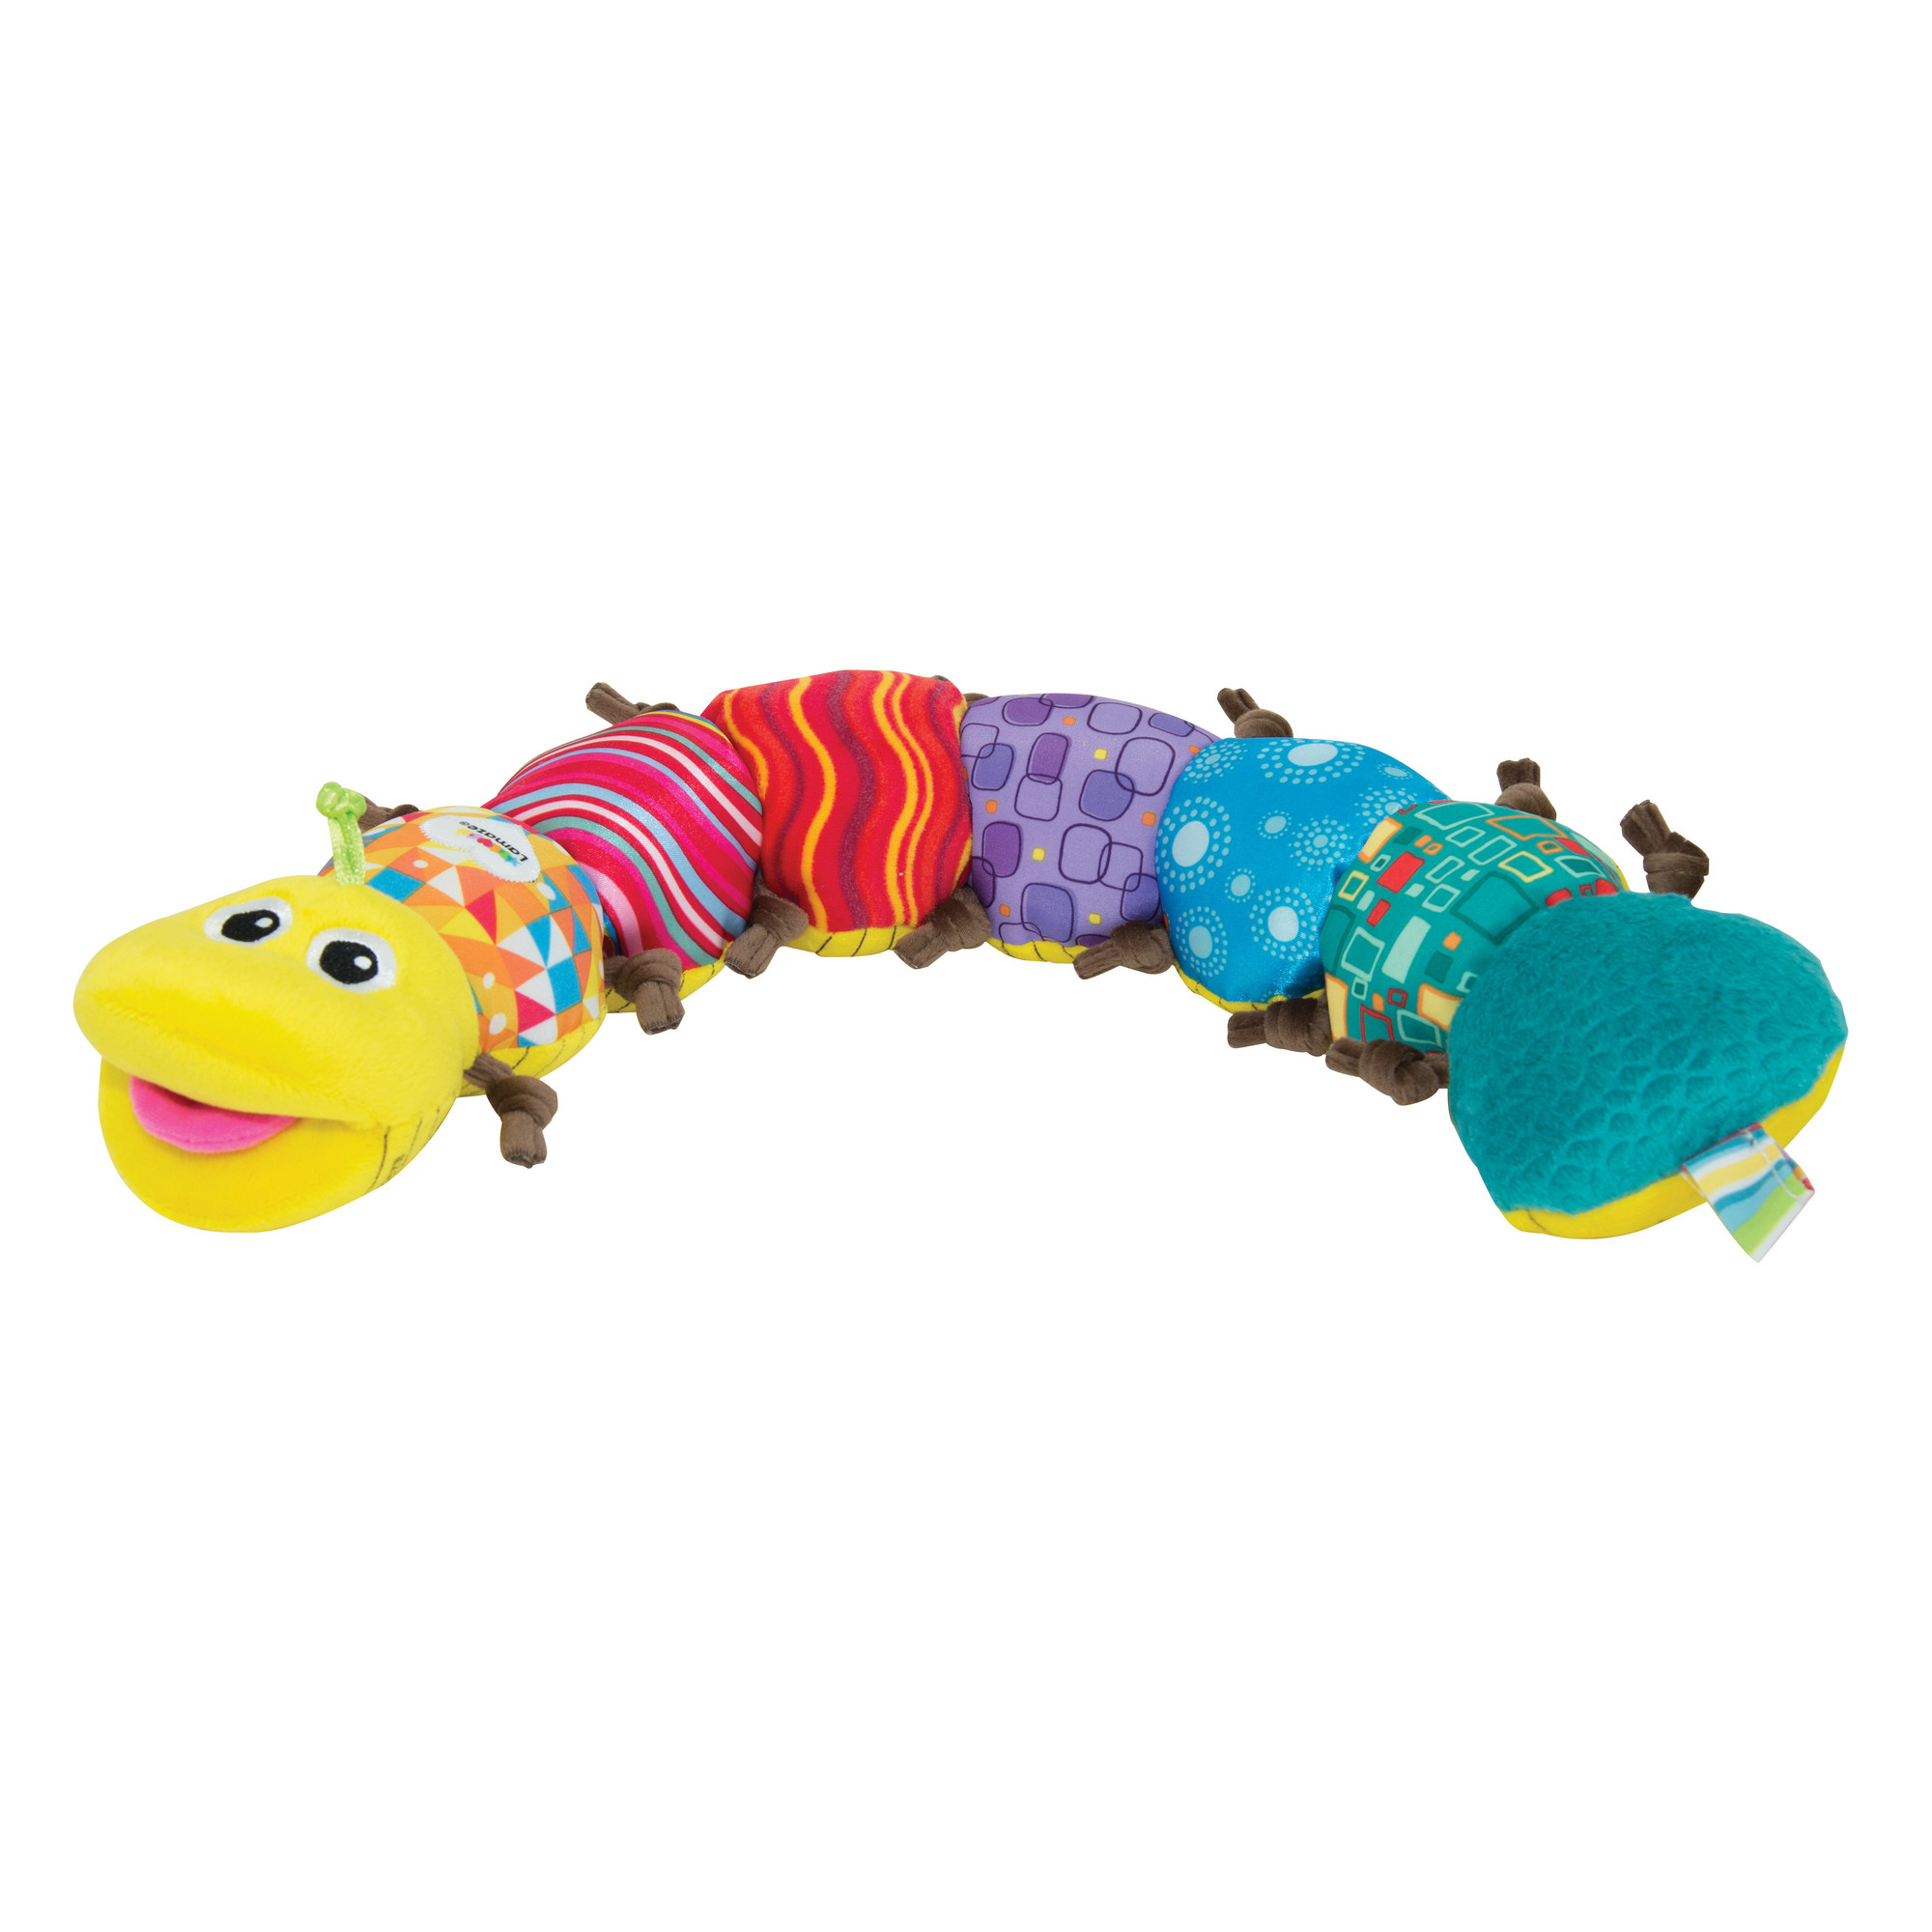 Lamaze Musical Inchworm by Lamaze